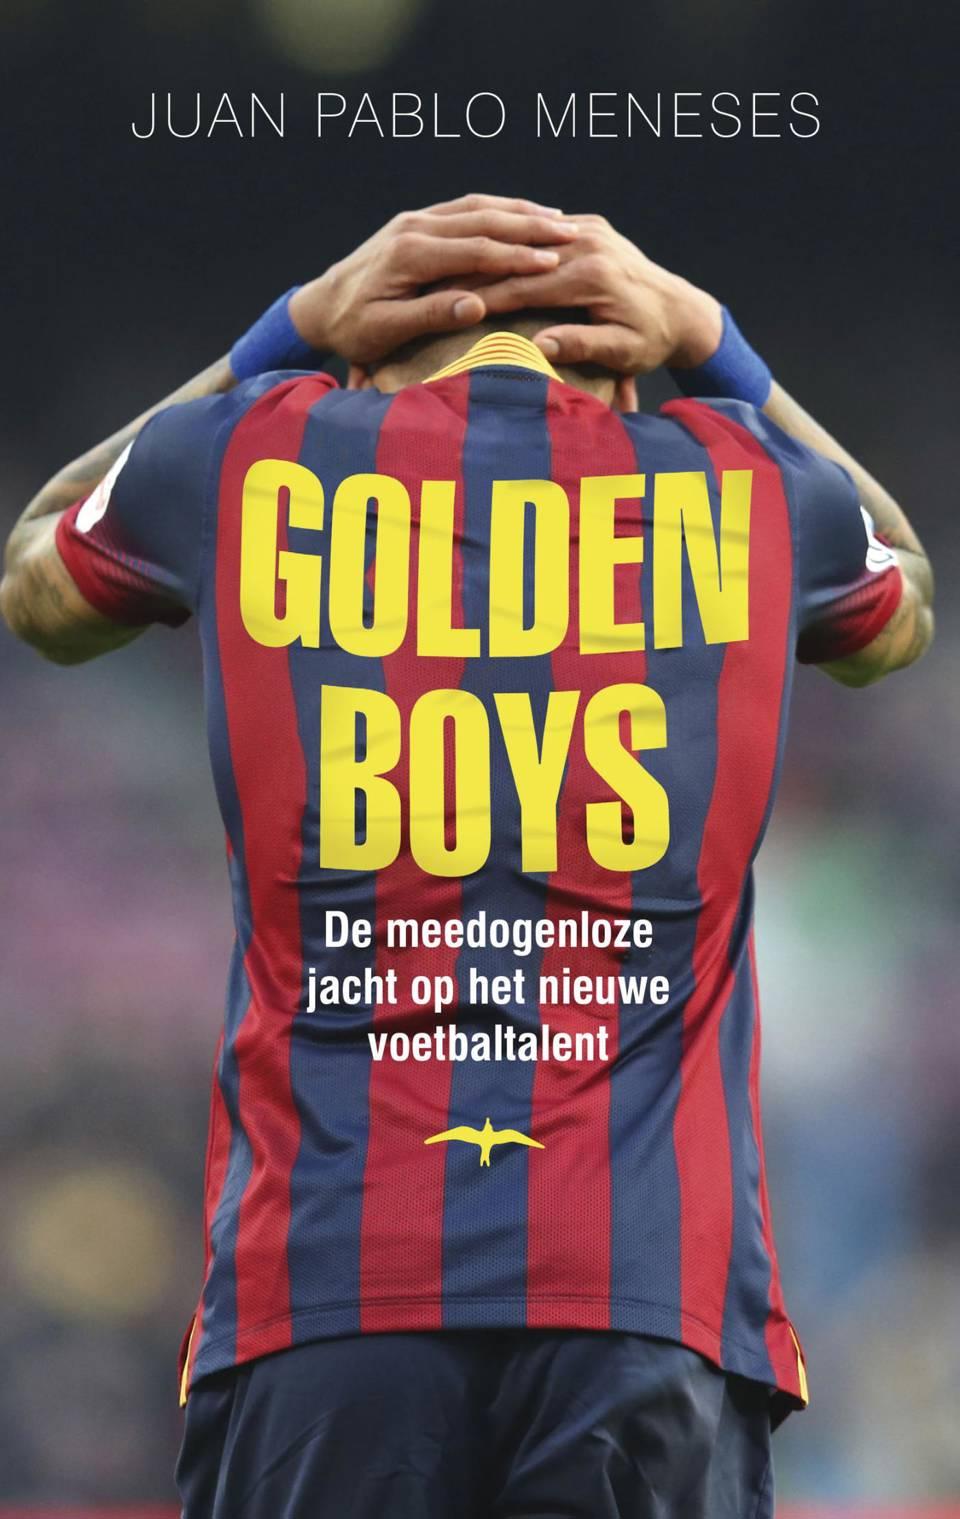 Golden boys | Juan Pablo Meneses | E-book | 9789400401990 | Standaard  Boekhandel